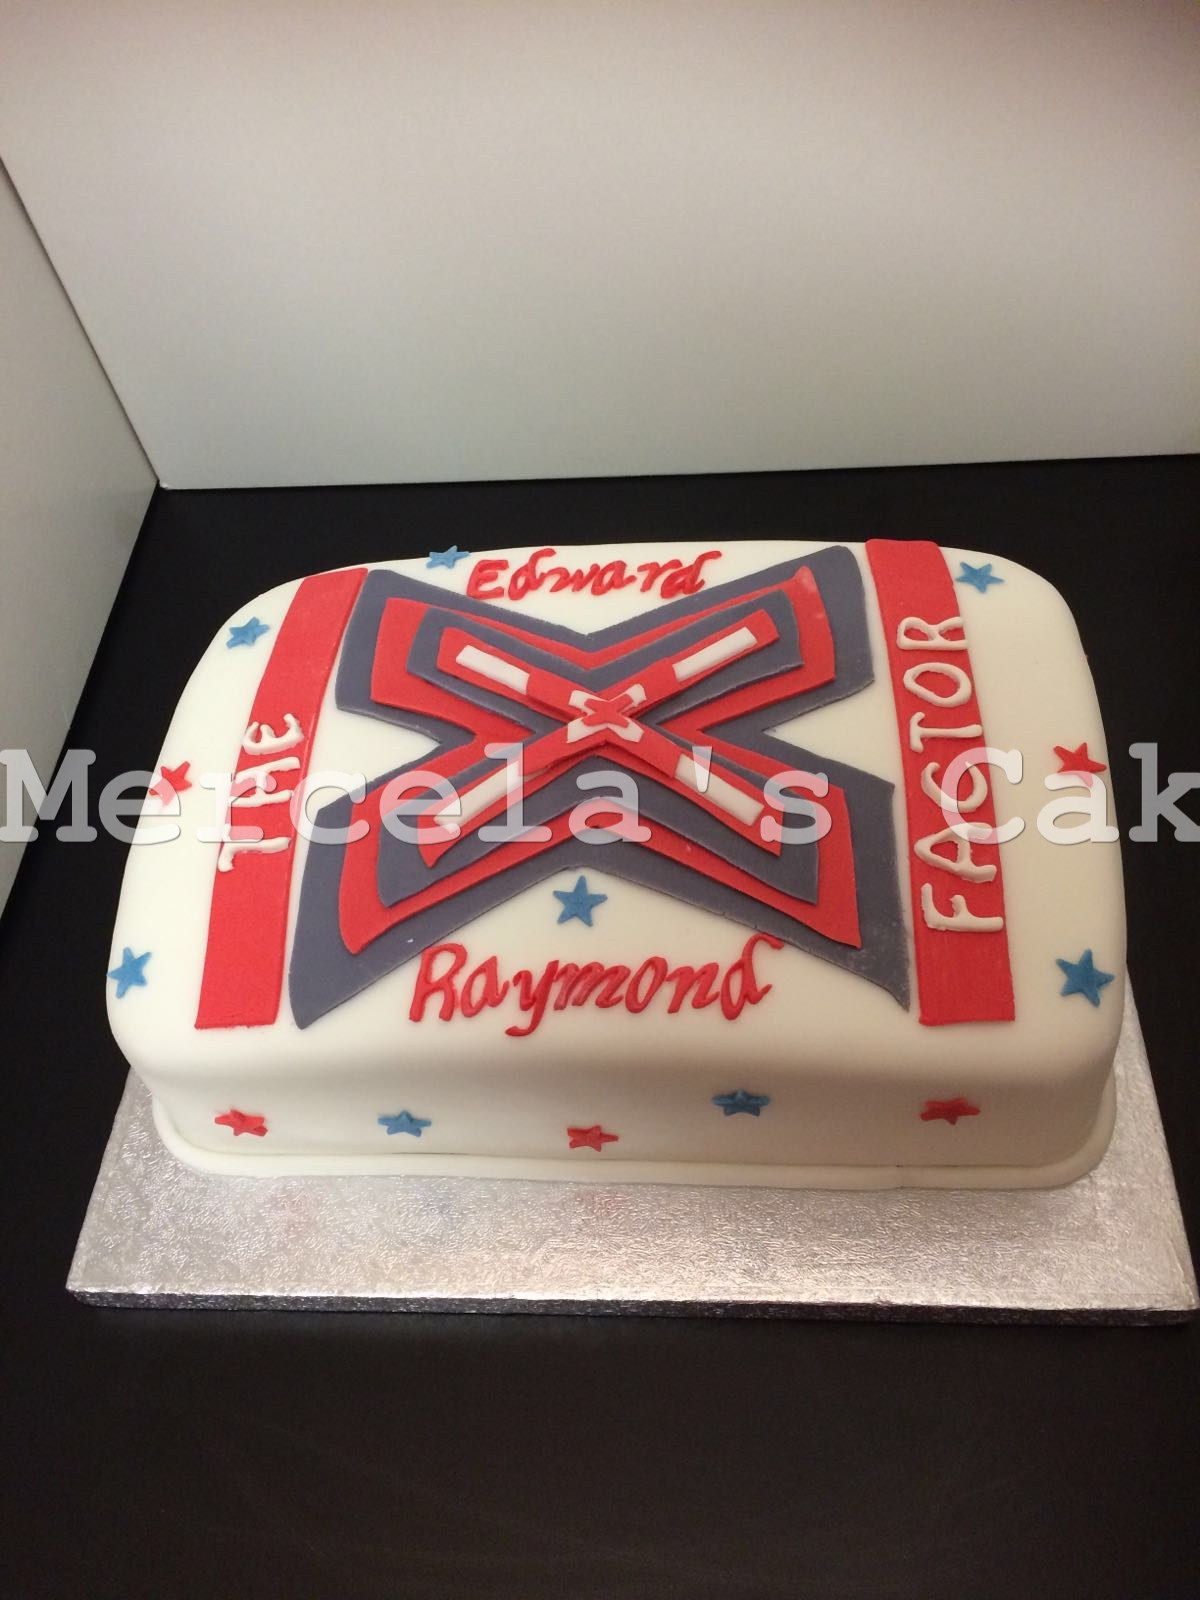 x-factor cake